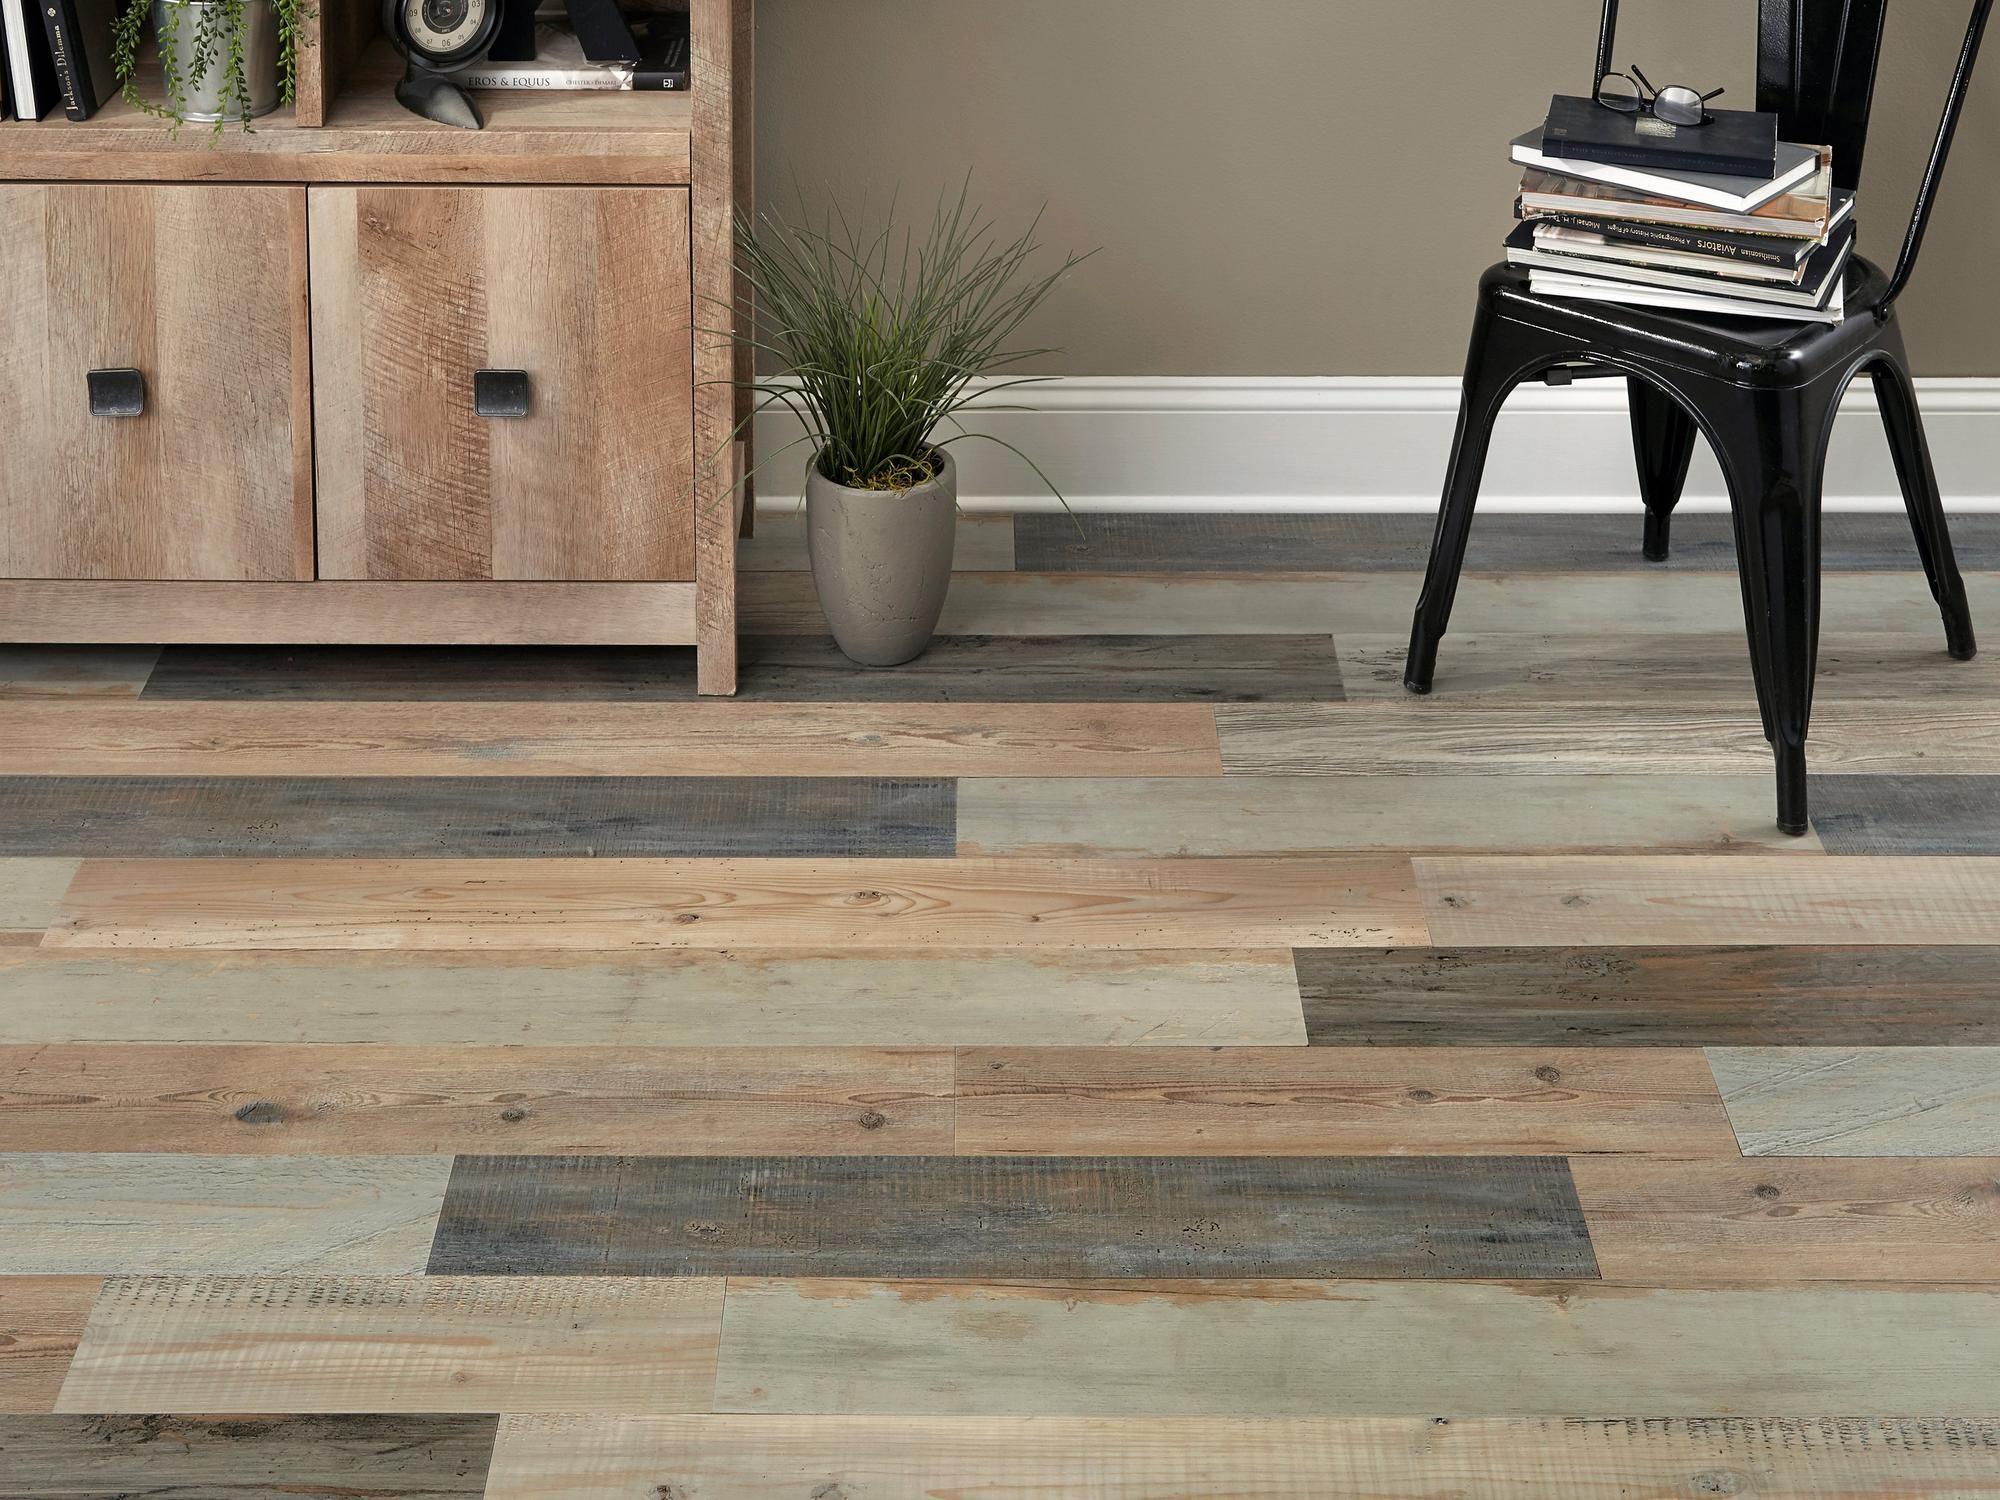 Cabinwood Rigid Core Luxury Vinyl Plank Cork Back